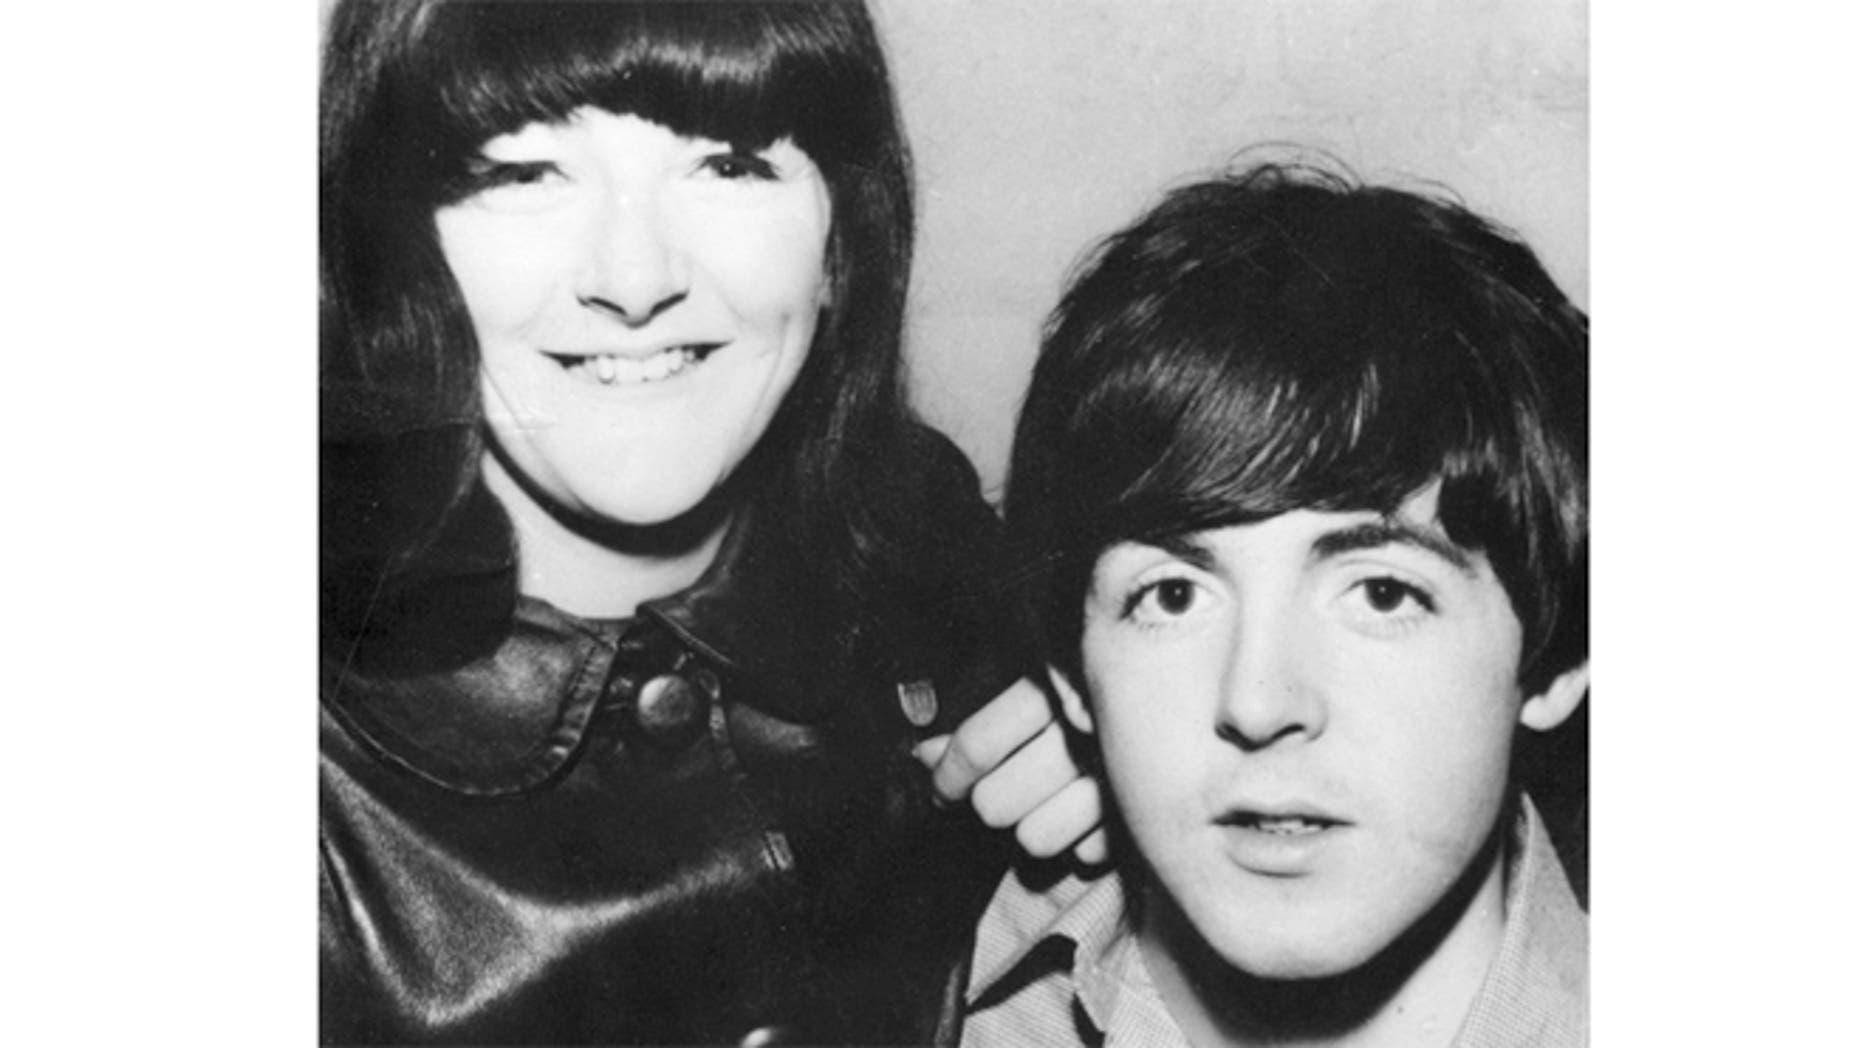 Freda Kelly is seen posing with Paul McCartney.